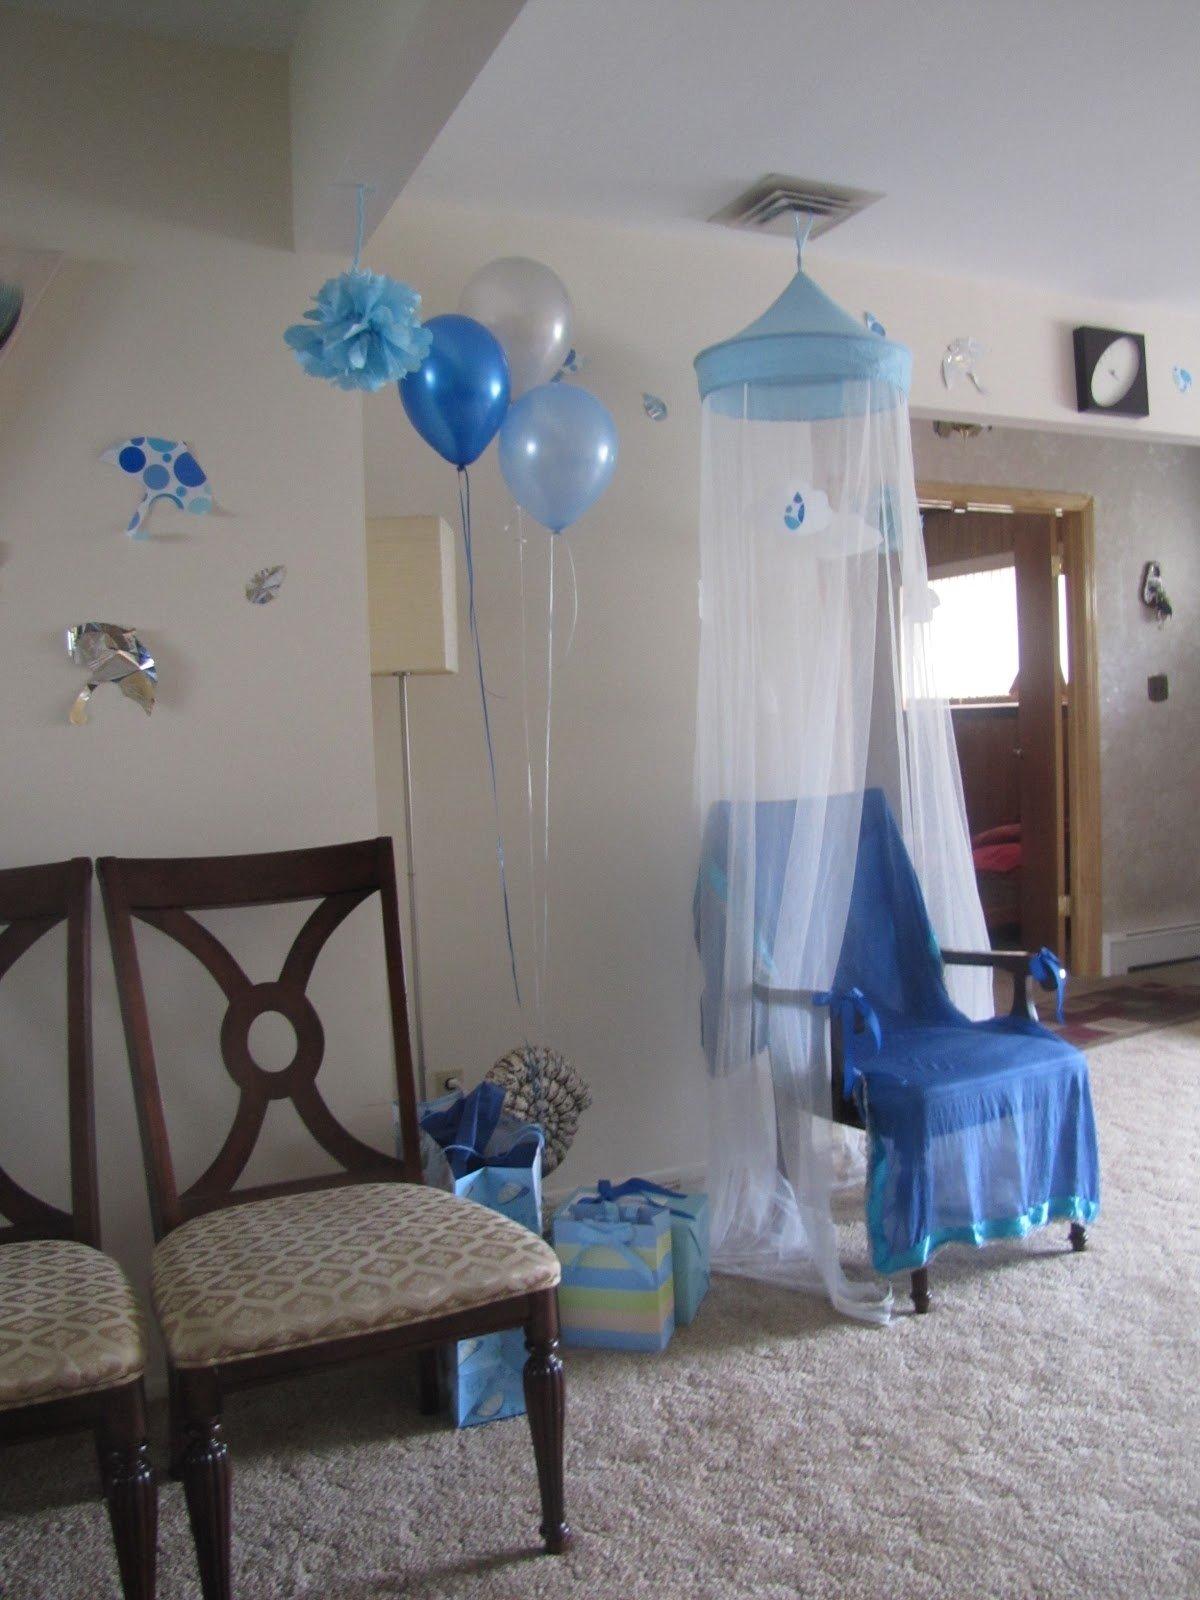 10 Fantastic Baby Shower Chair Decoration Ideas ideas baby shower chair decoration how to decorate wonderful modern 2021